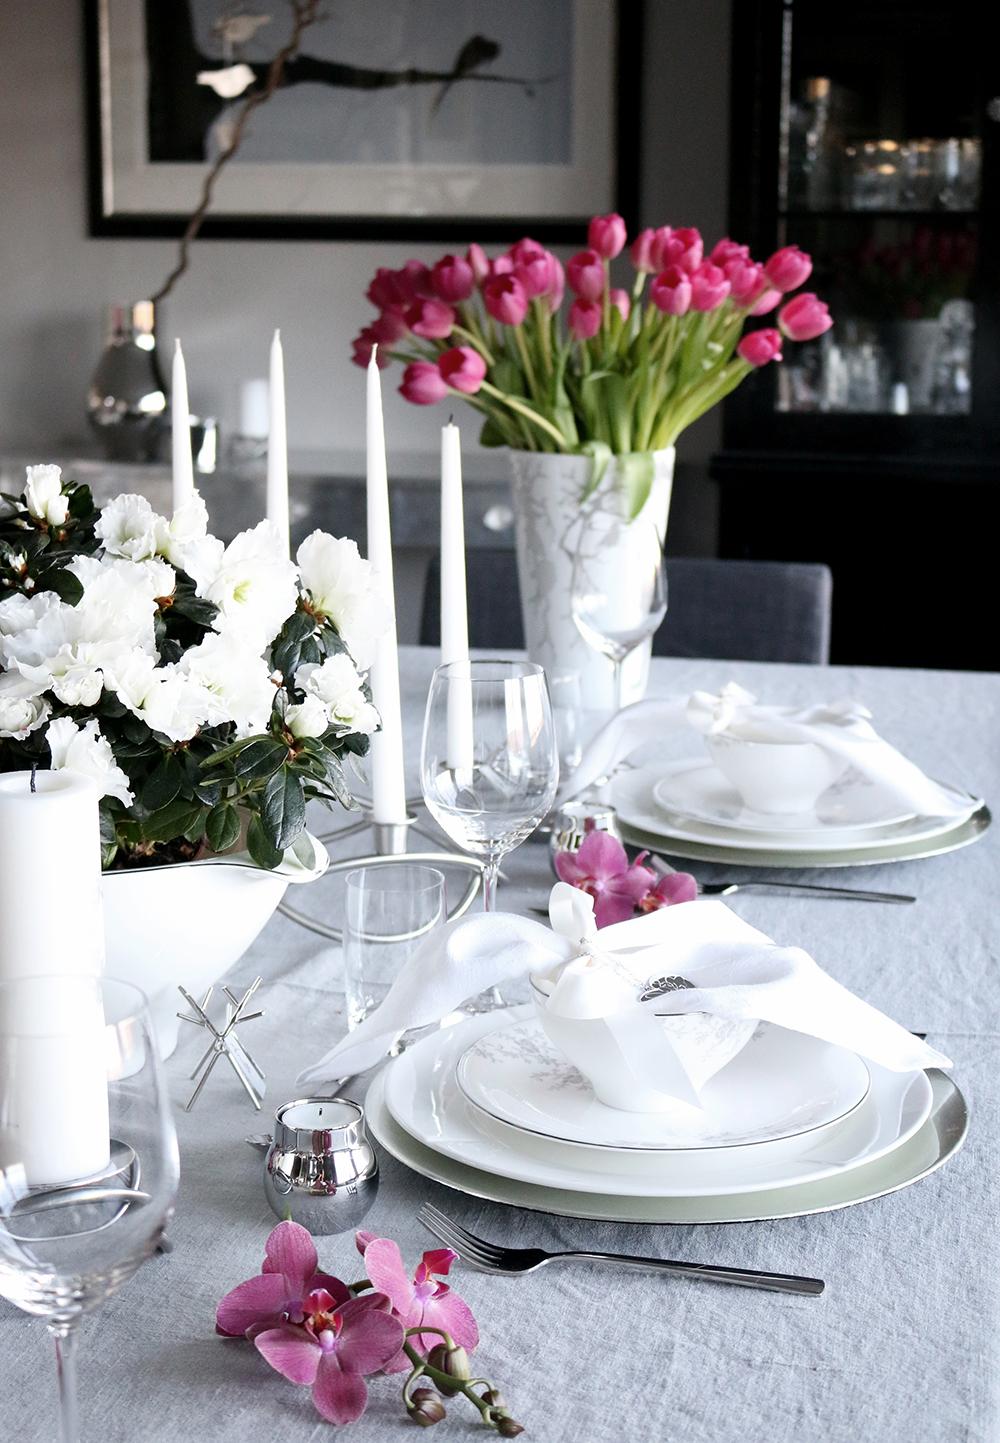 Tilbords Table setting Advent grey hvite purple 26